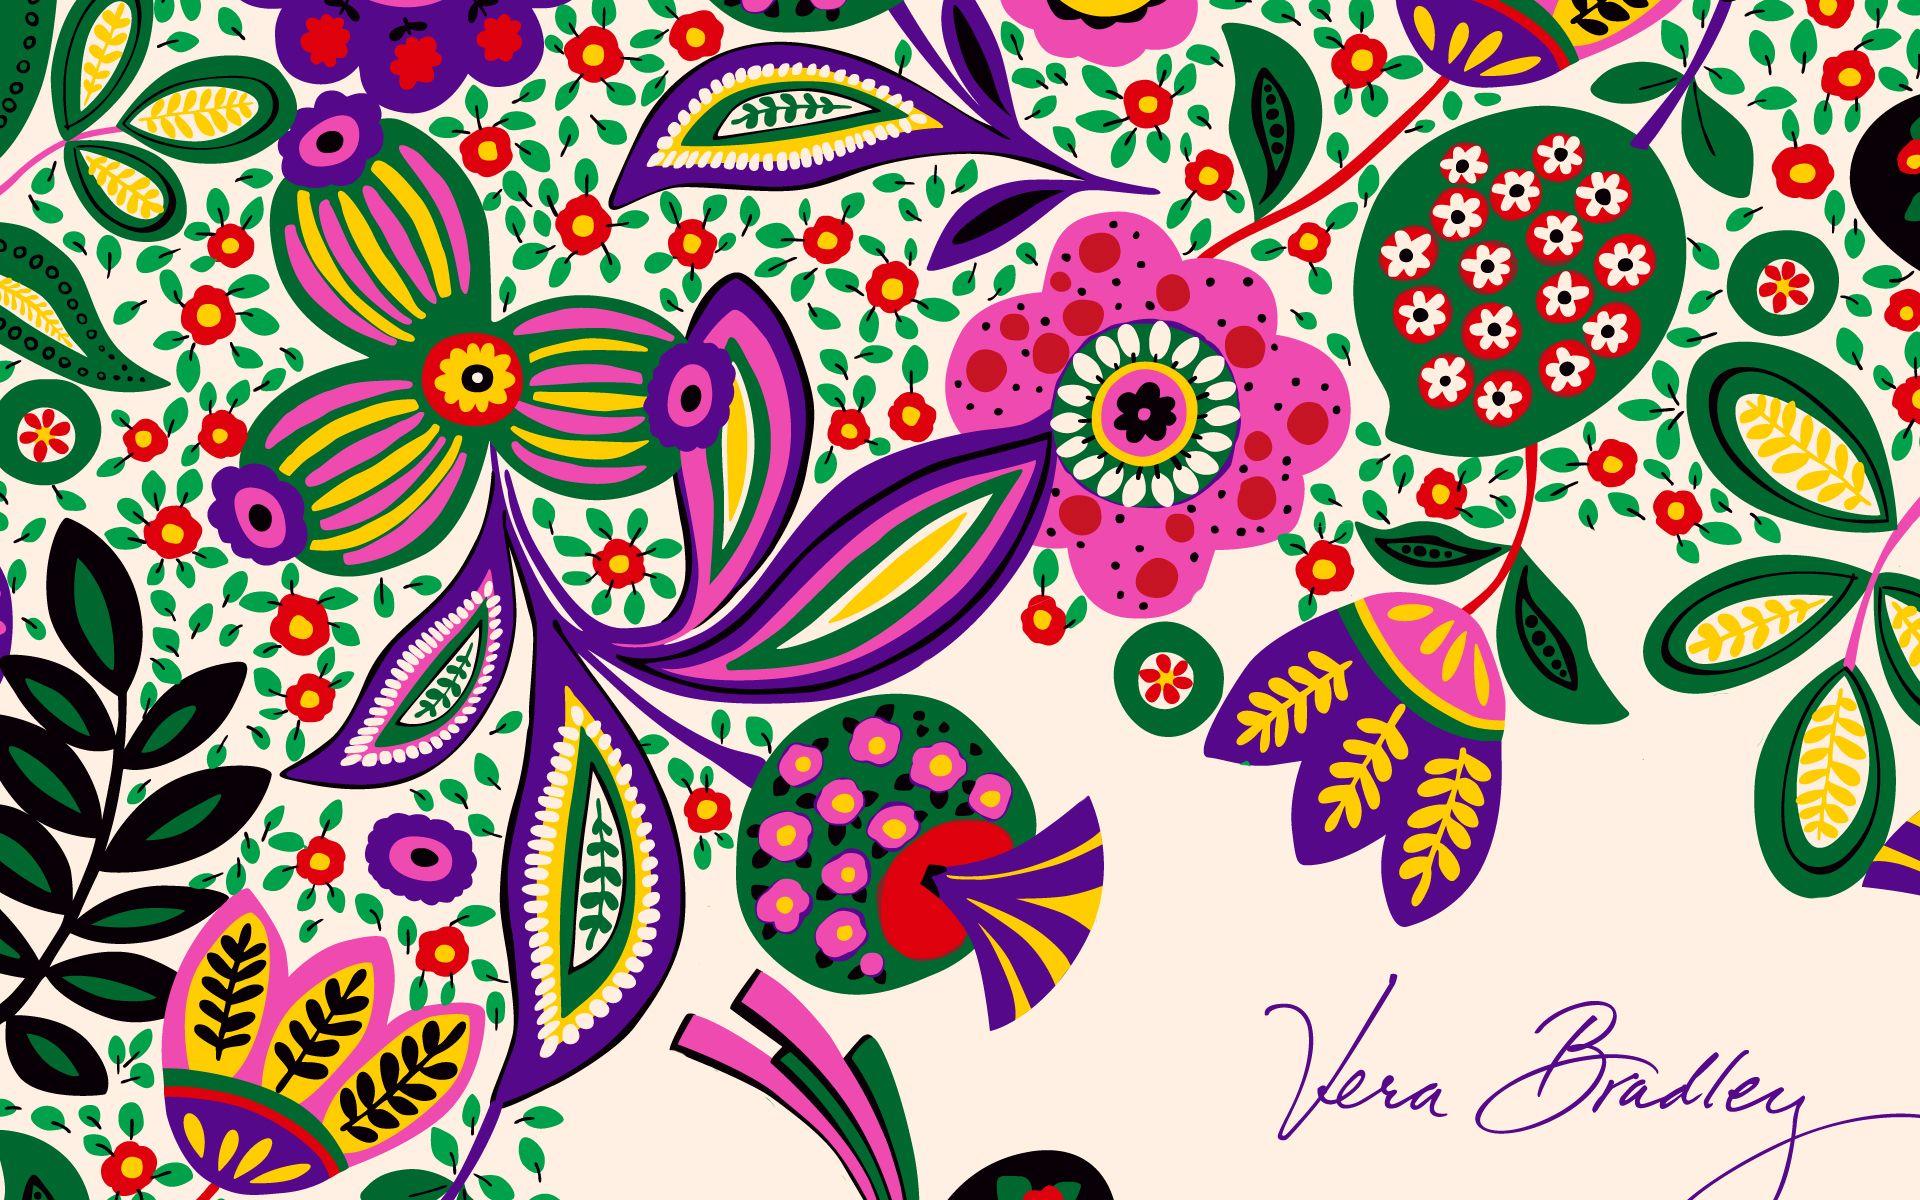 Vera bradley shower curtain - Desktop_vb M11 Vivalavera 1900x1200 Jpg 1 920 1 200 Pixels